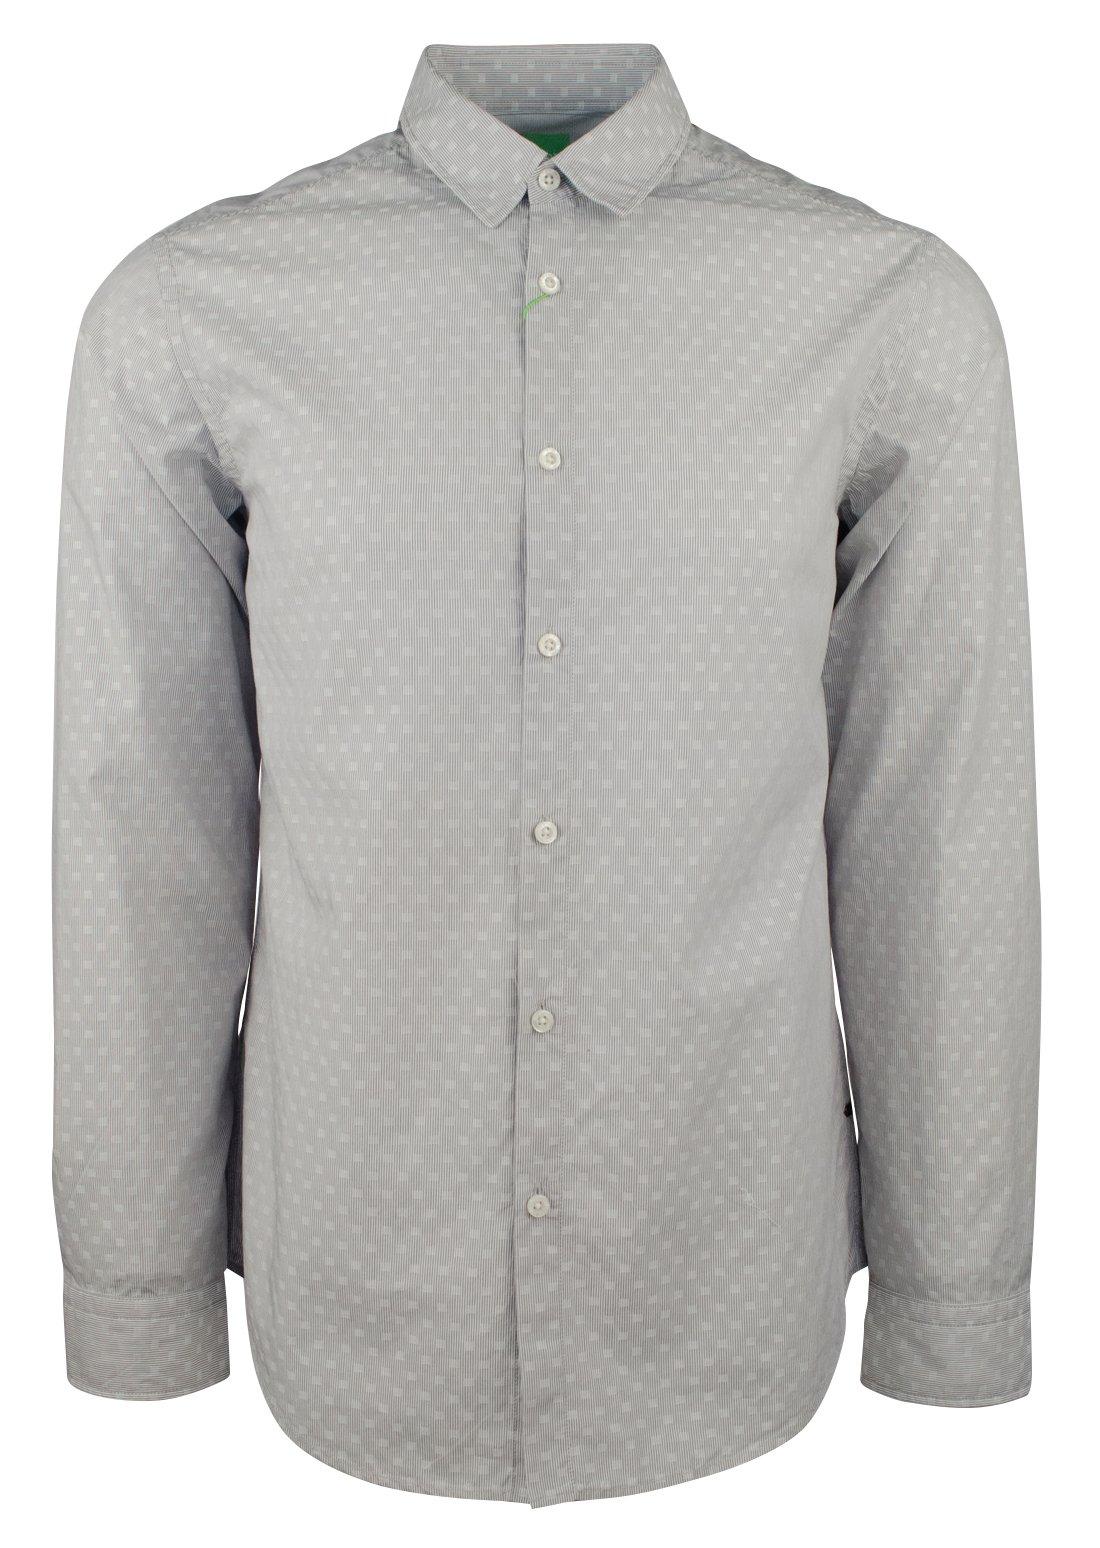 Hugo Boss Men's Green Label C-Bustai Geometric Regular Fit Shirt-LG-M